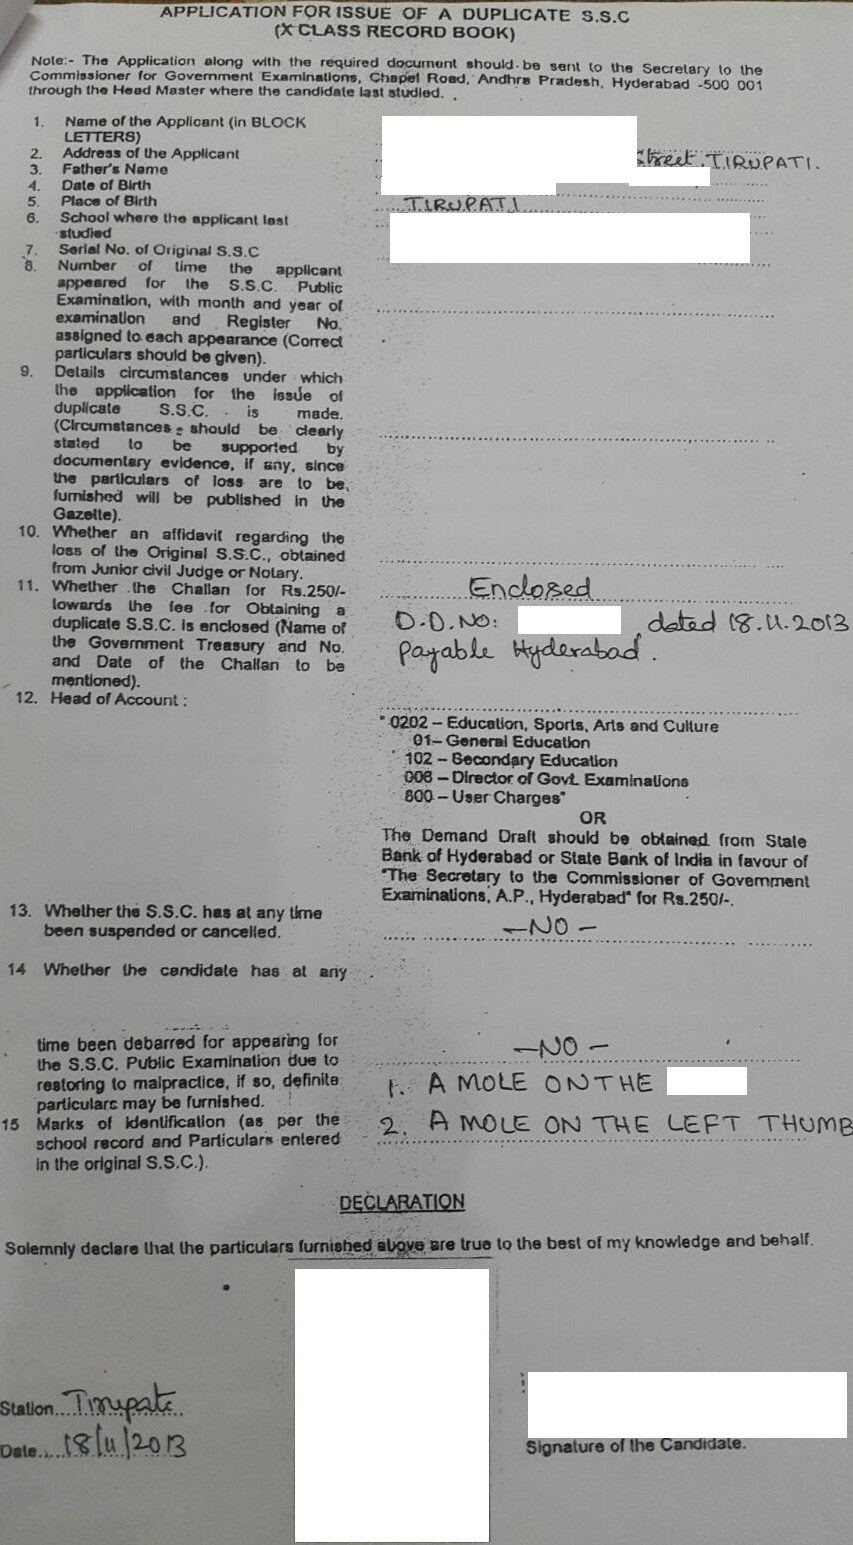 Regain Lost Certificate Andhra Pradesh Telugu Tourism - Www